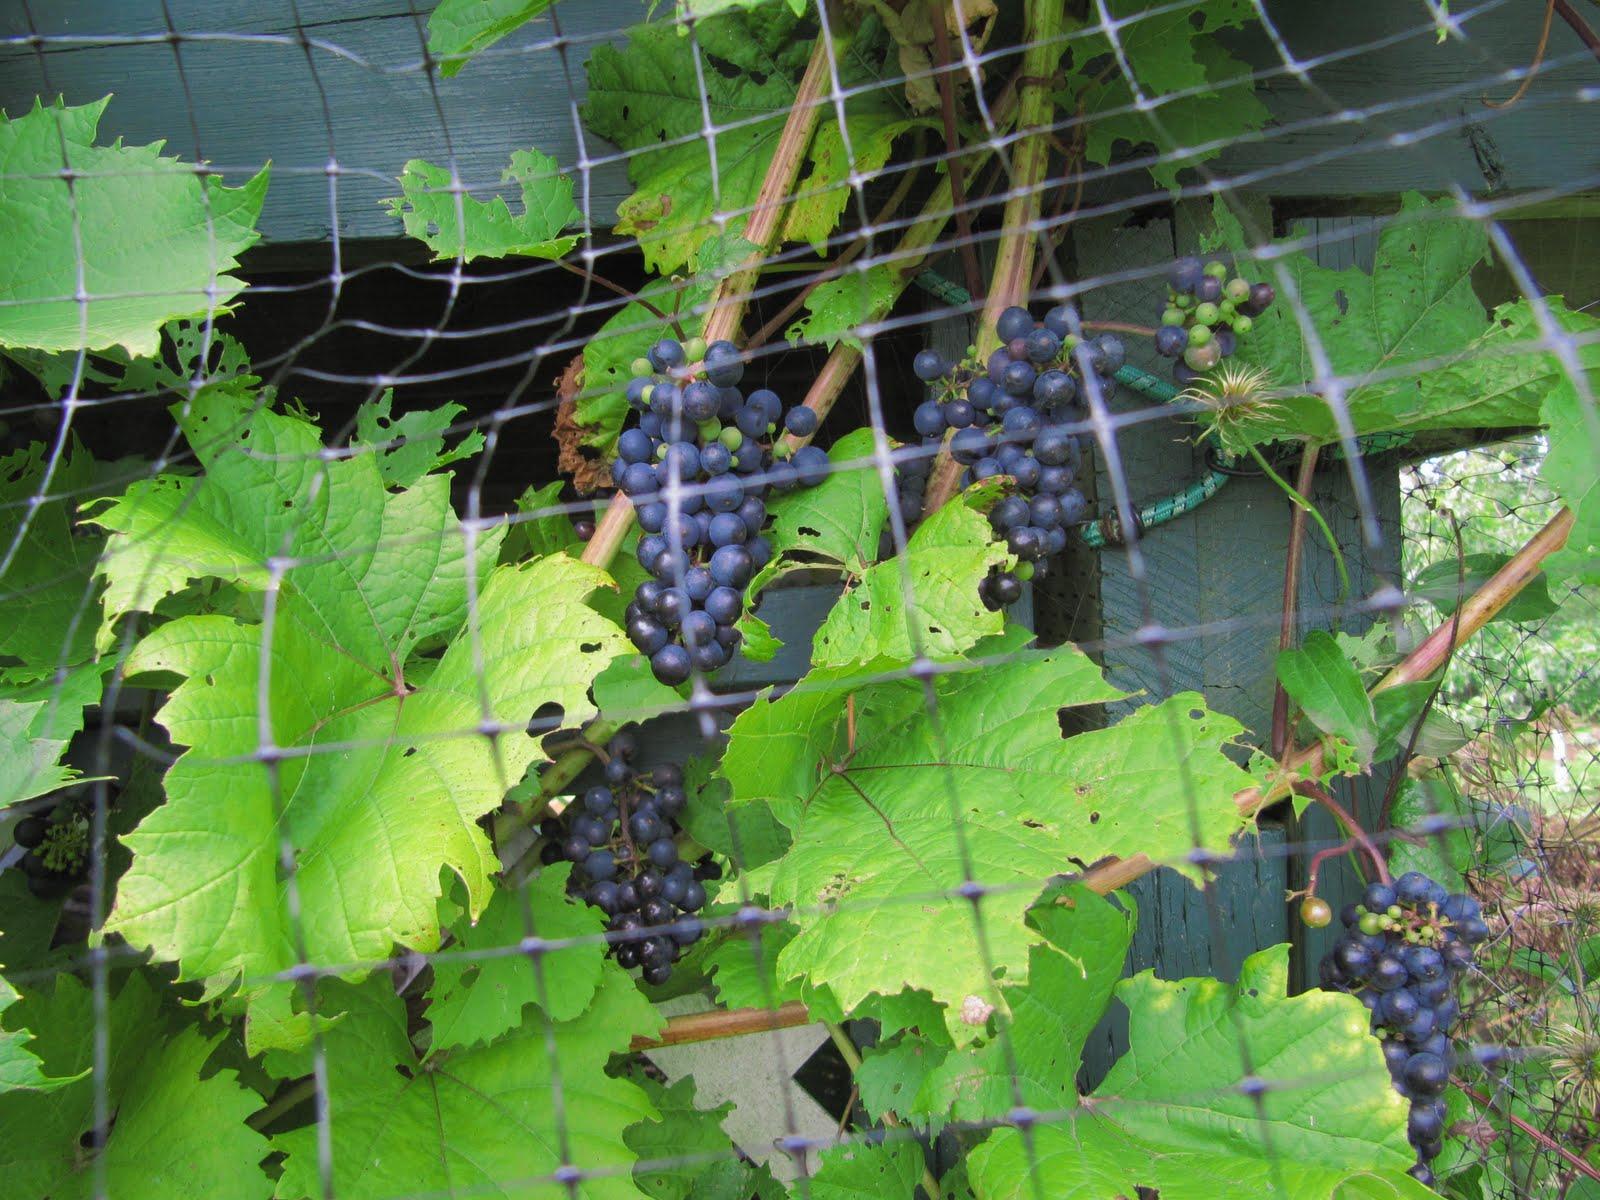 Heidi in the garden: Critter damage II: Sour grapes